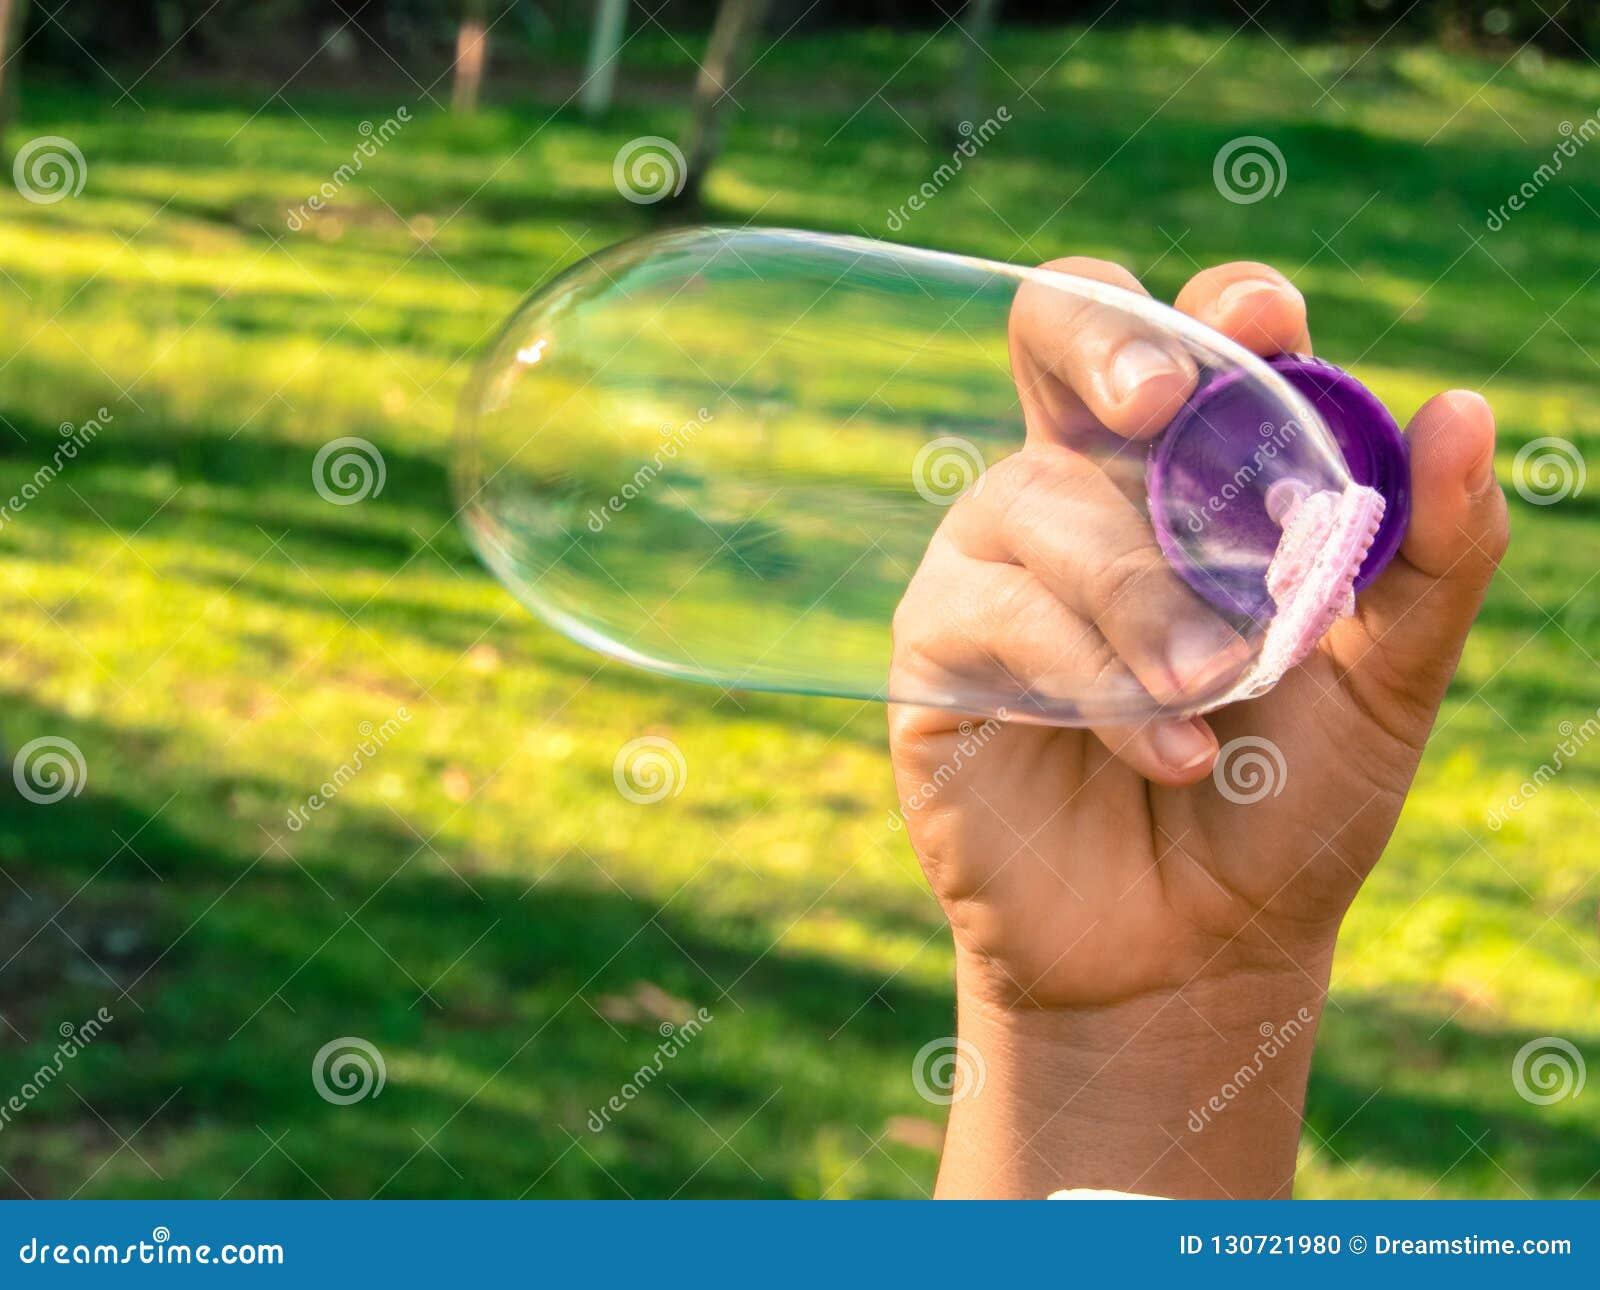 Soap bubble in the park